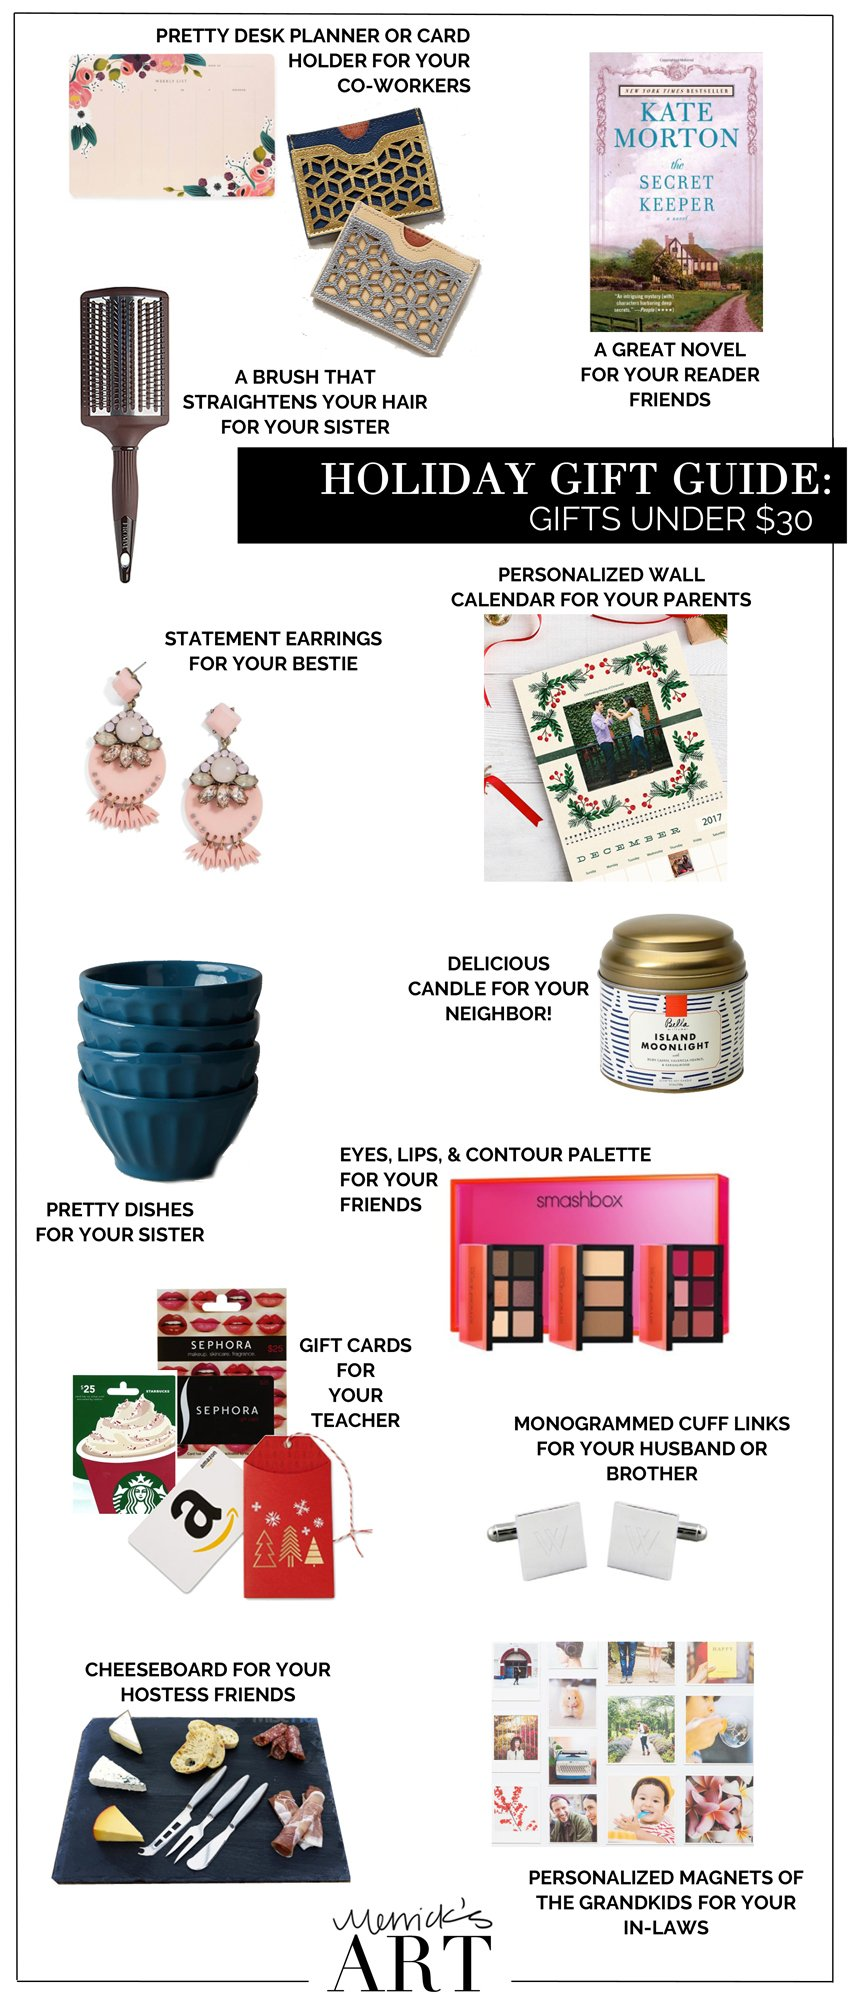 Merrick's Art Gifts under $30